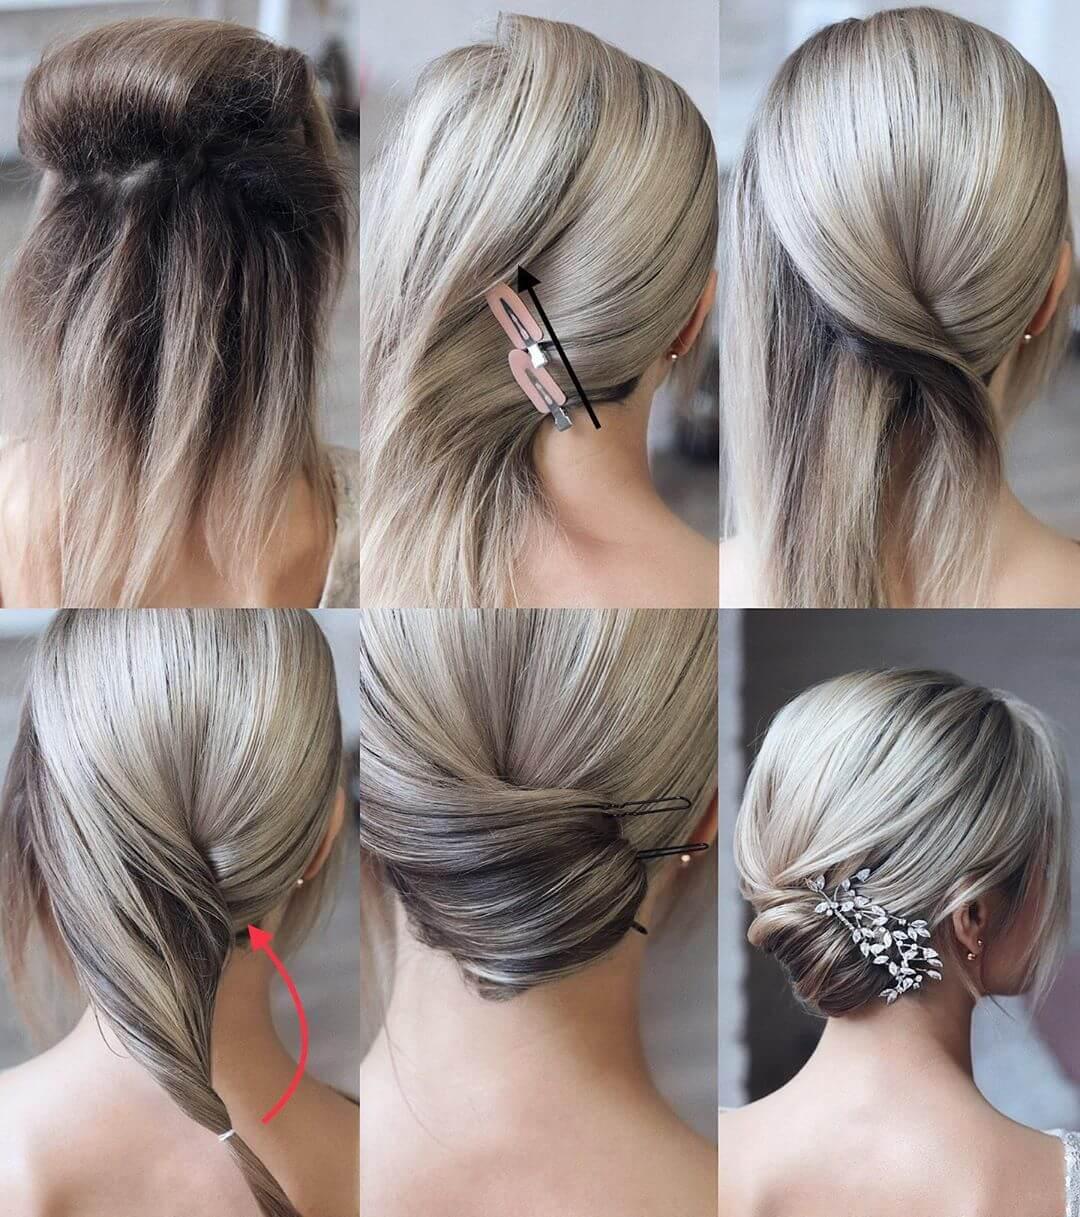 Step by Step Bridal flat bun Hairstyles for Long, Medium, Short Hair